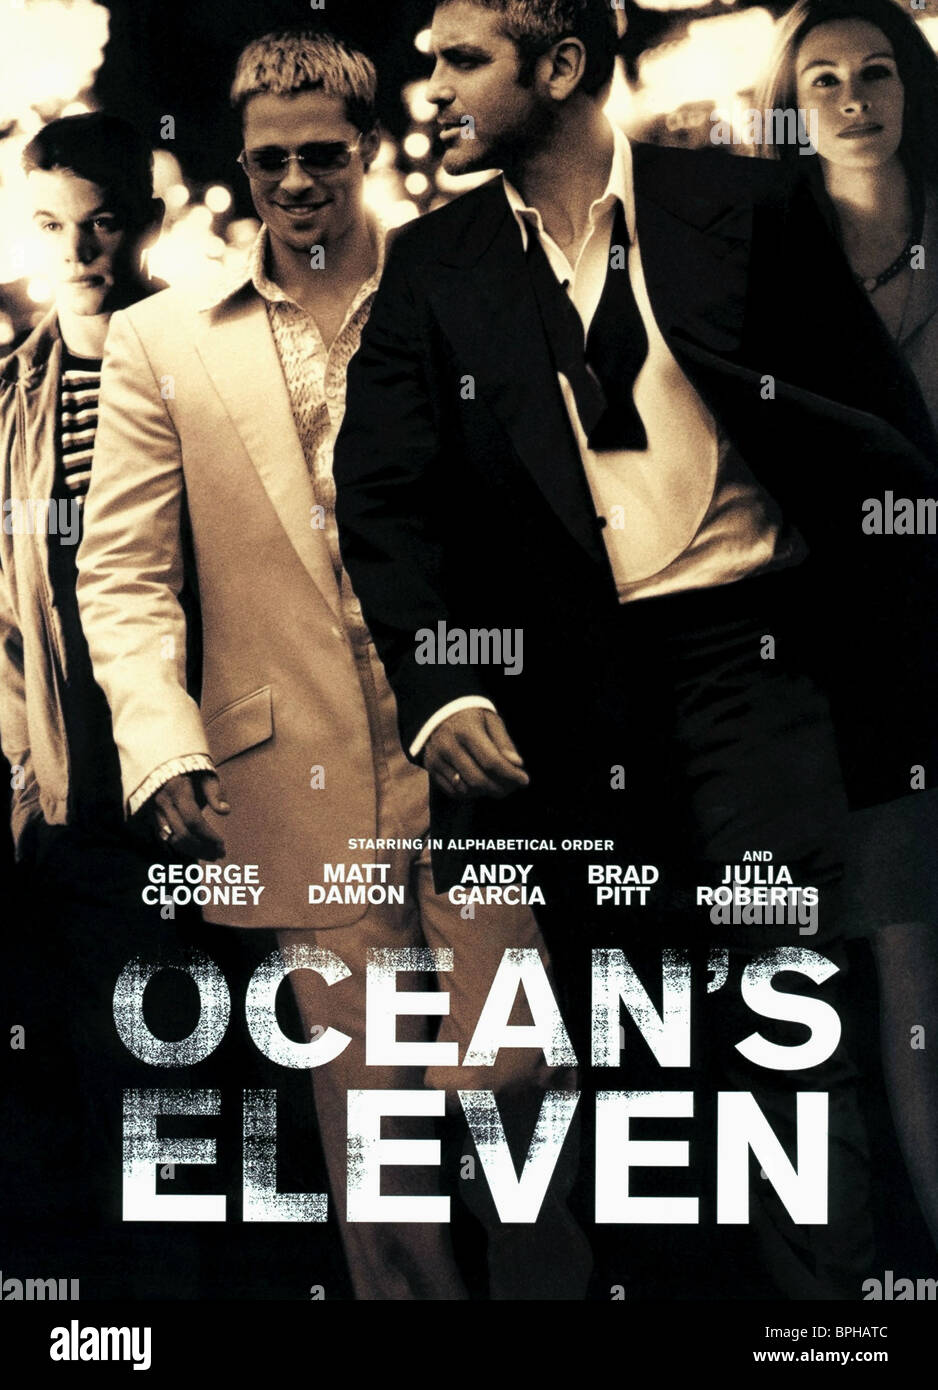 FILM POSTER OCEAN'S ELEVEN (2001) - Stock Image